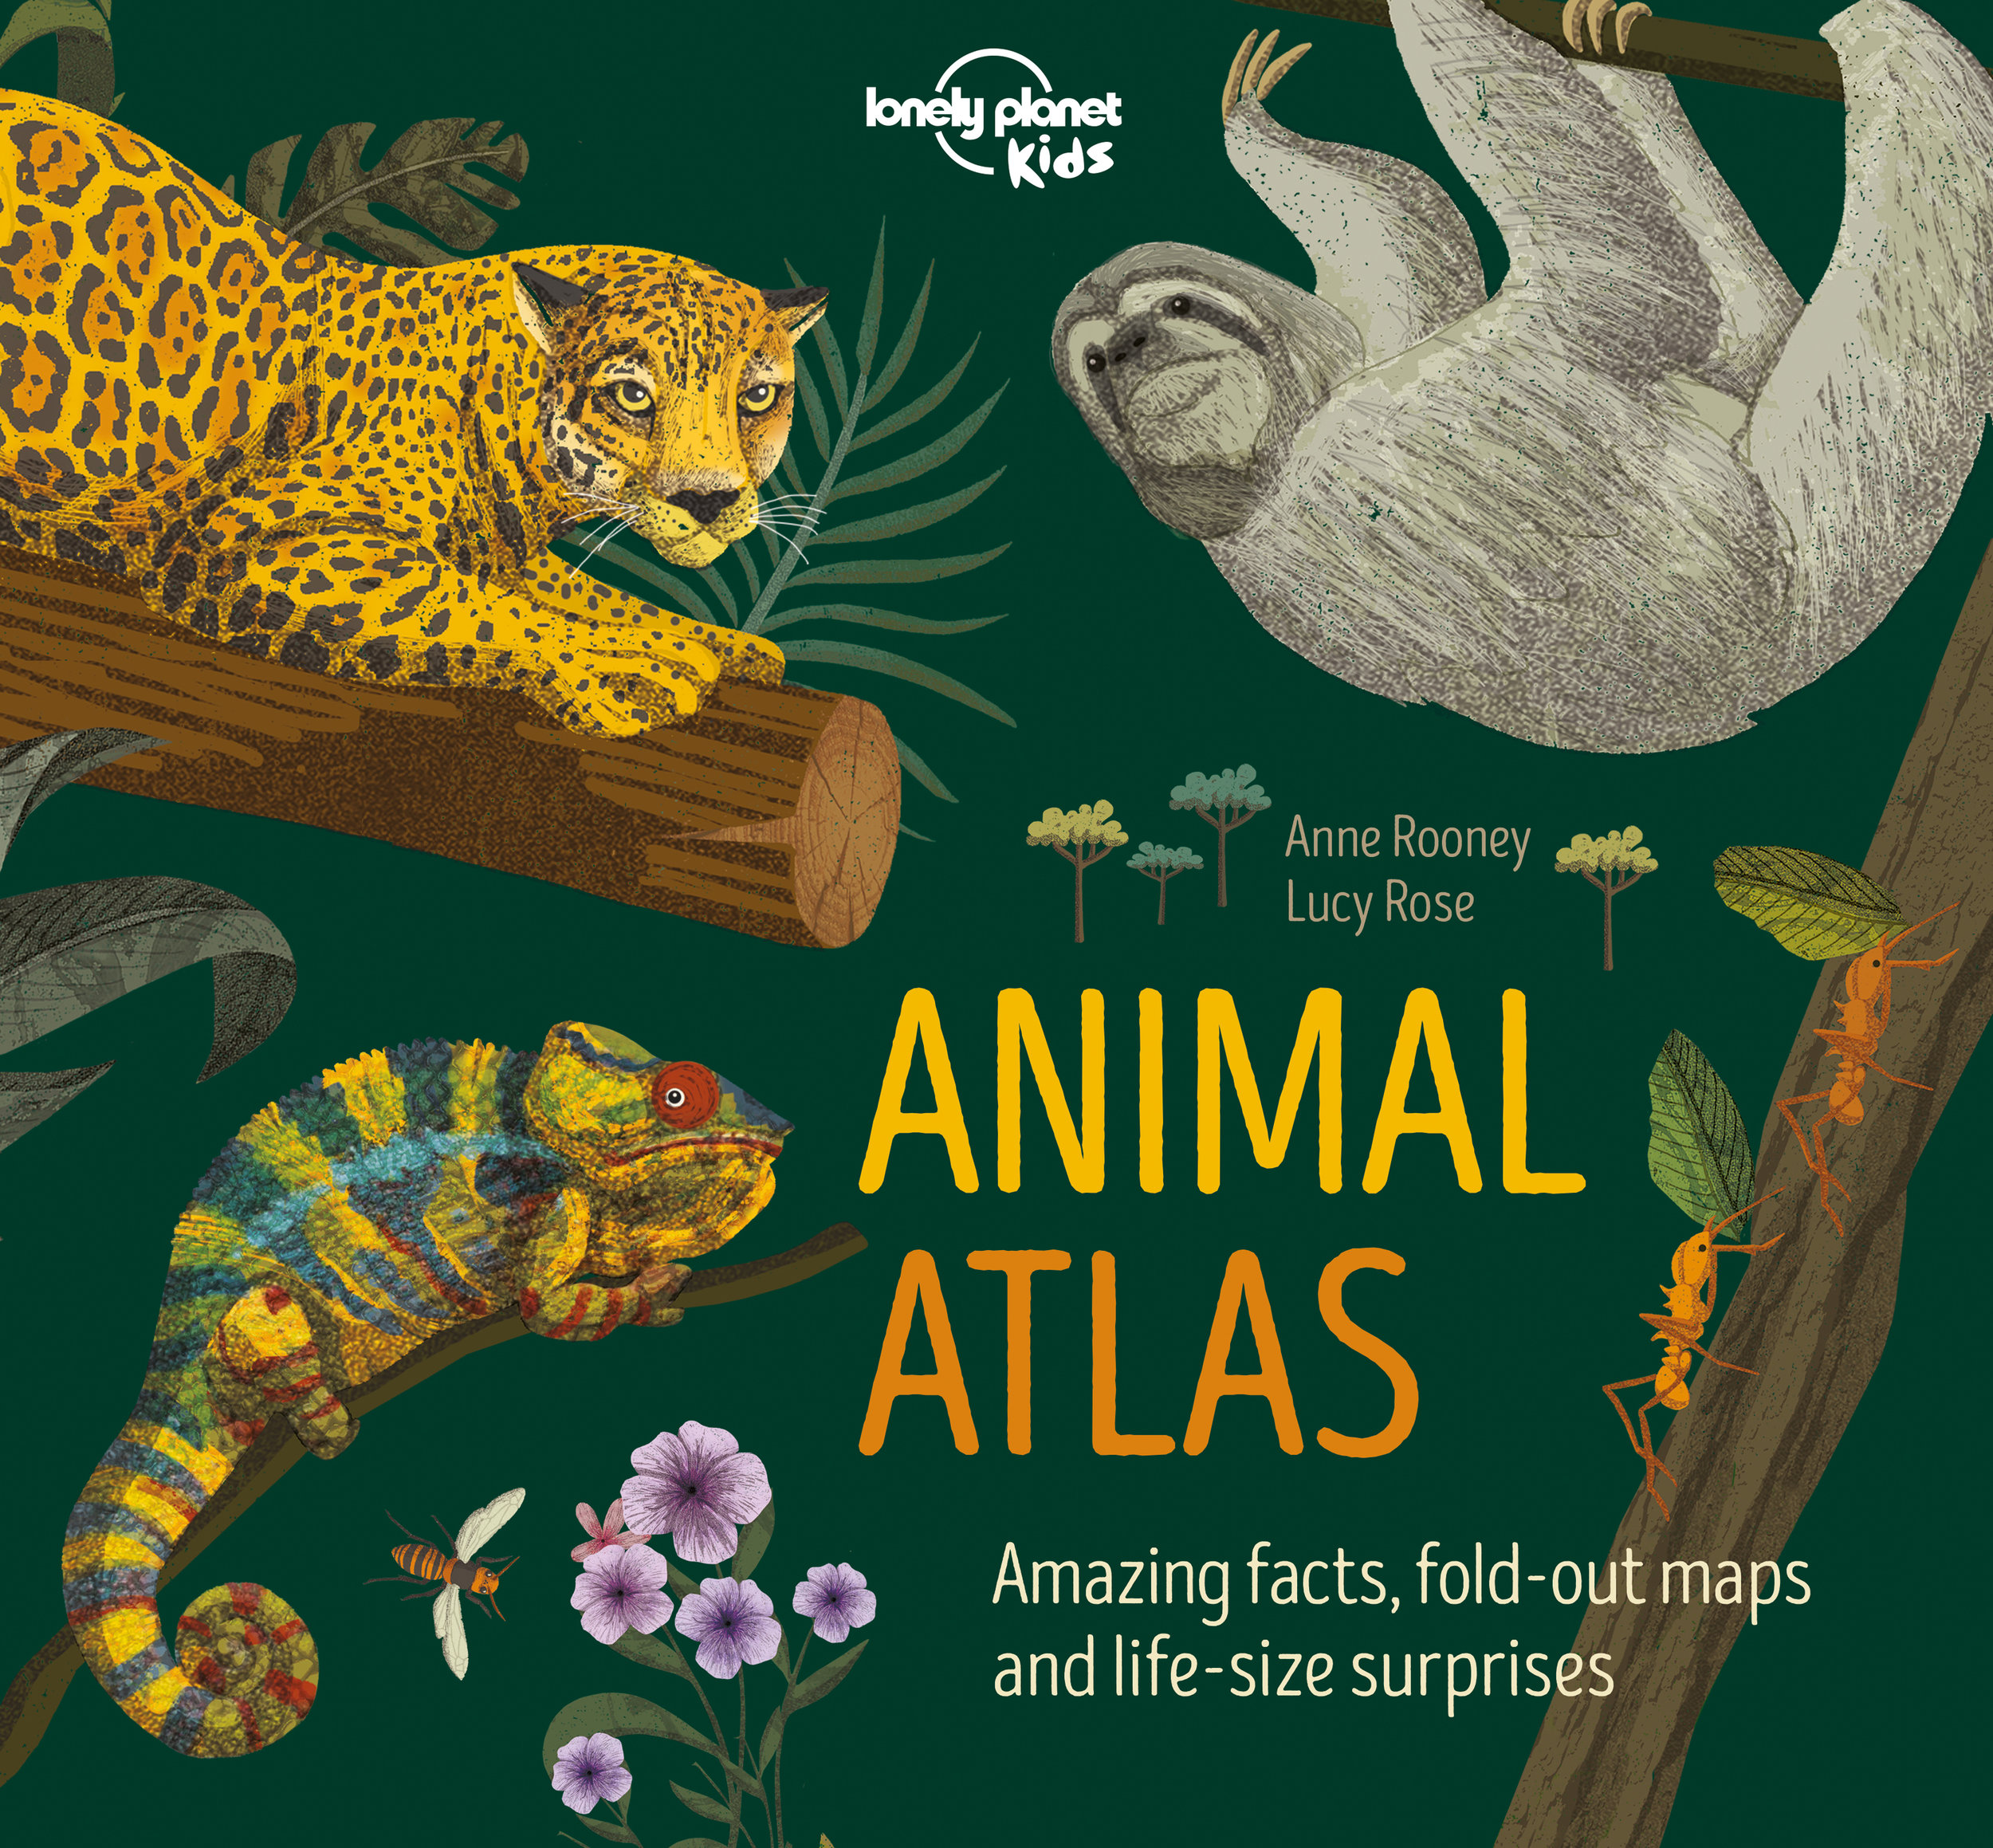 LP kids animal atlas.jpeg